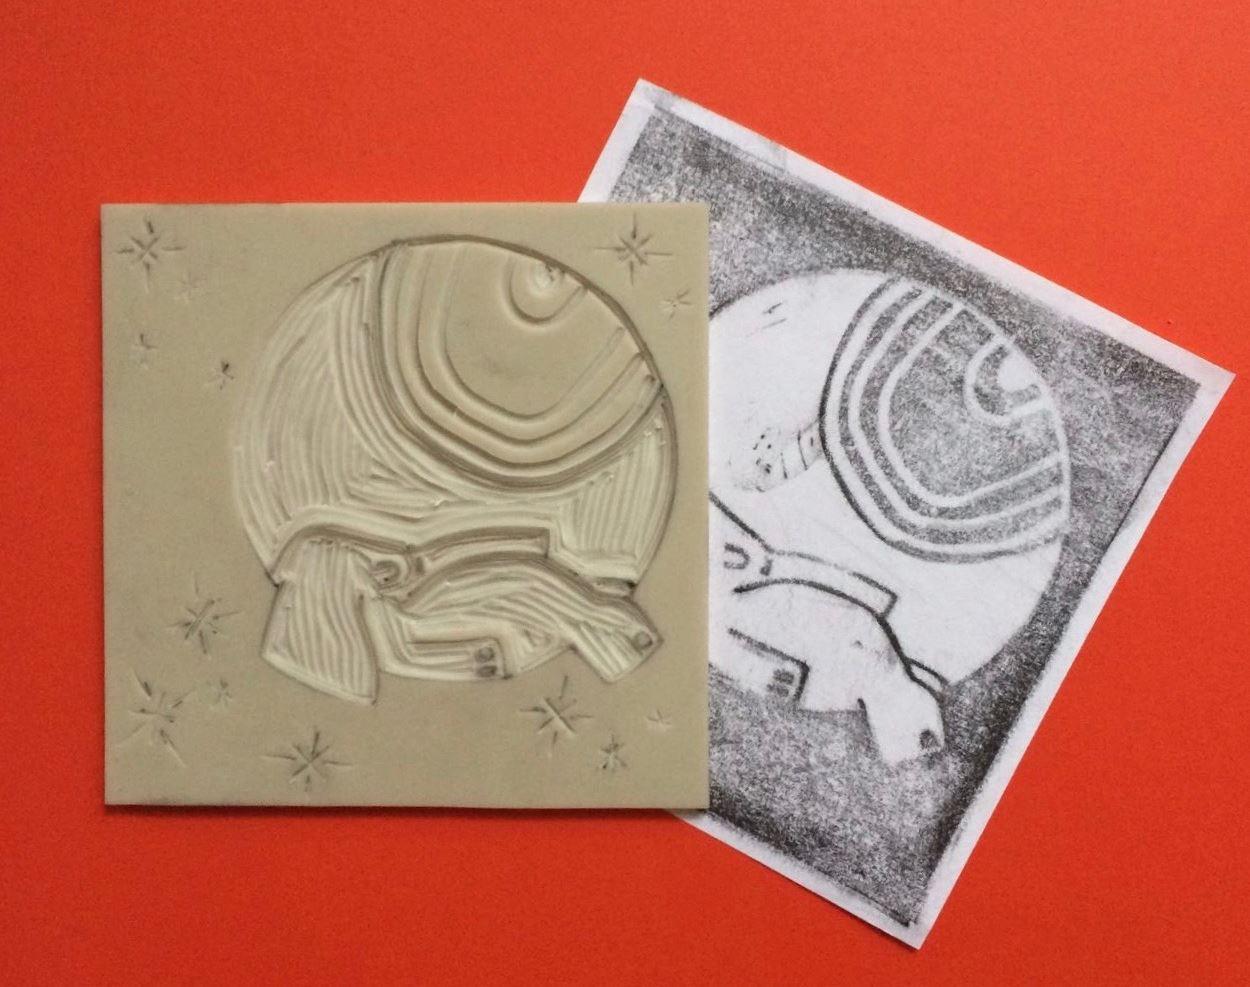 Linolschnitt_Elefant_Linocut_Elephant_Linoprint.jpg